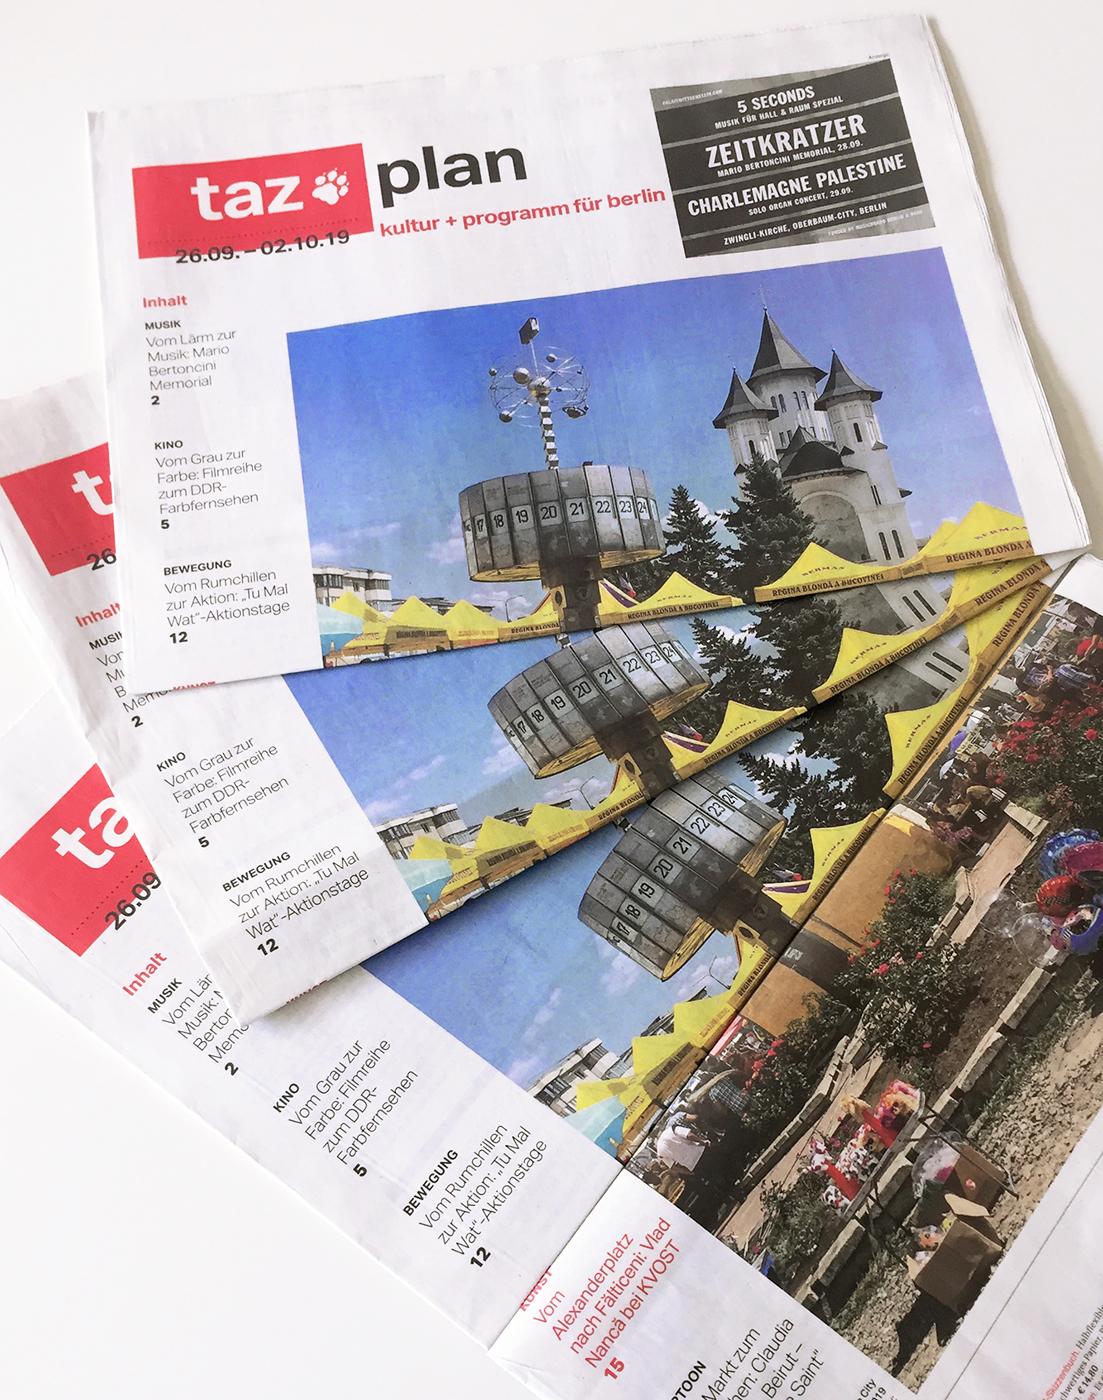 taz plan / culture and program / Berlin